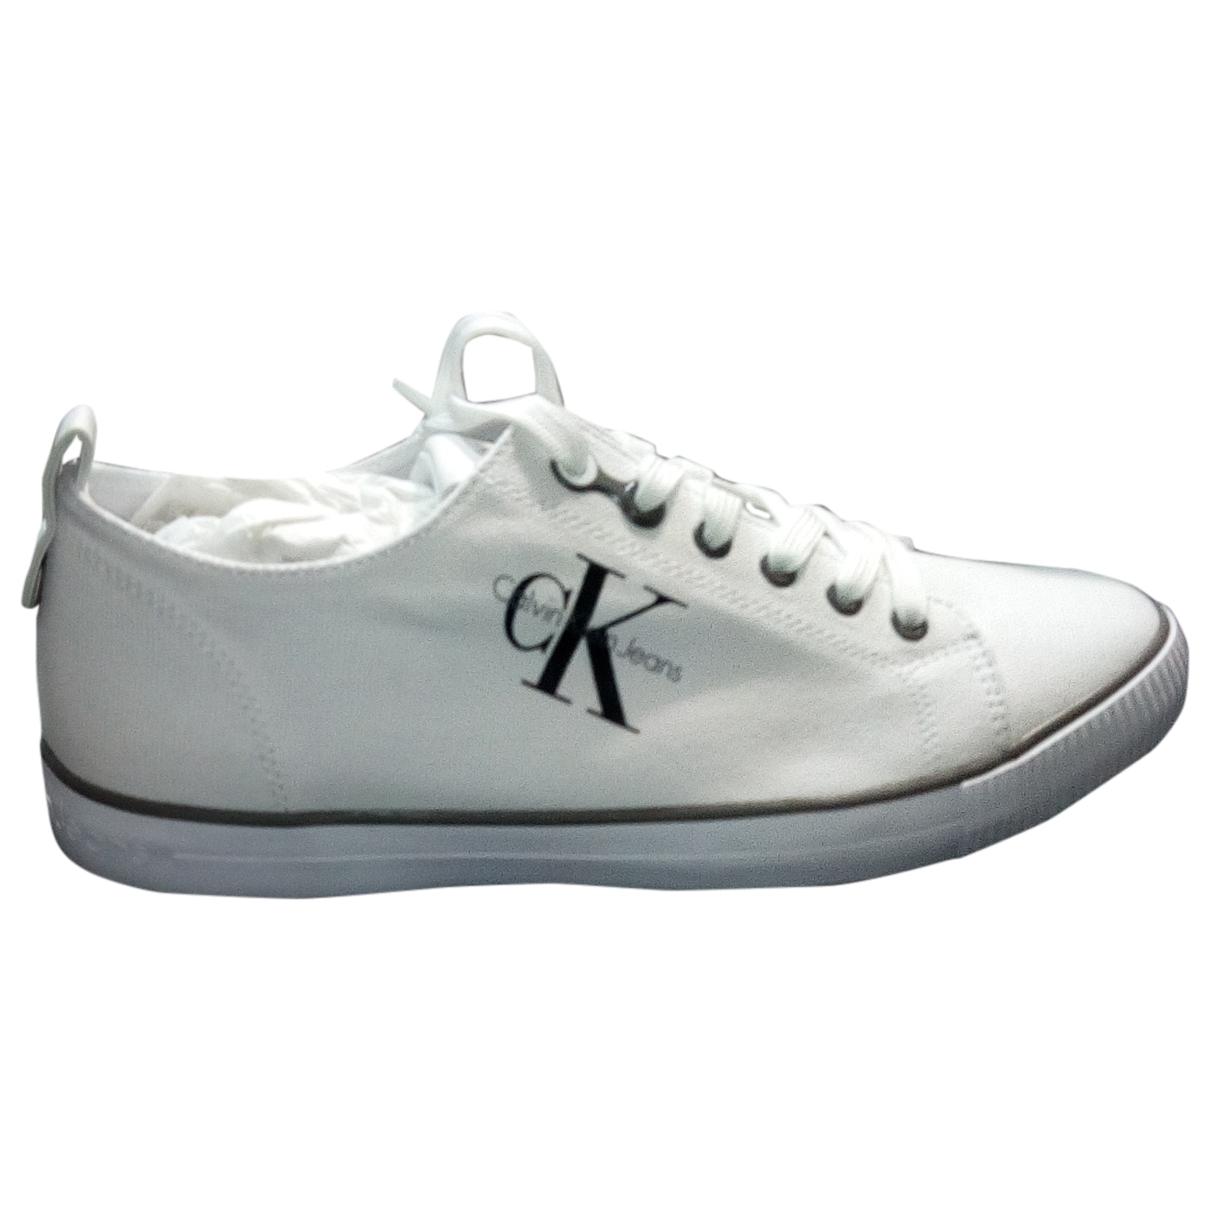 Calvin Klein \N Sneakers in  Weiss Leinen